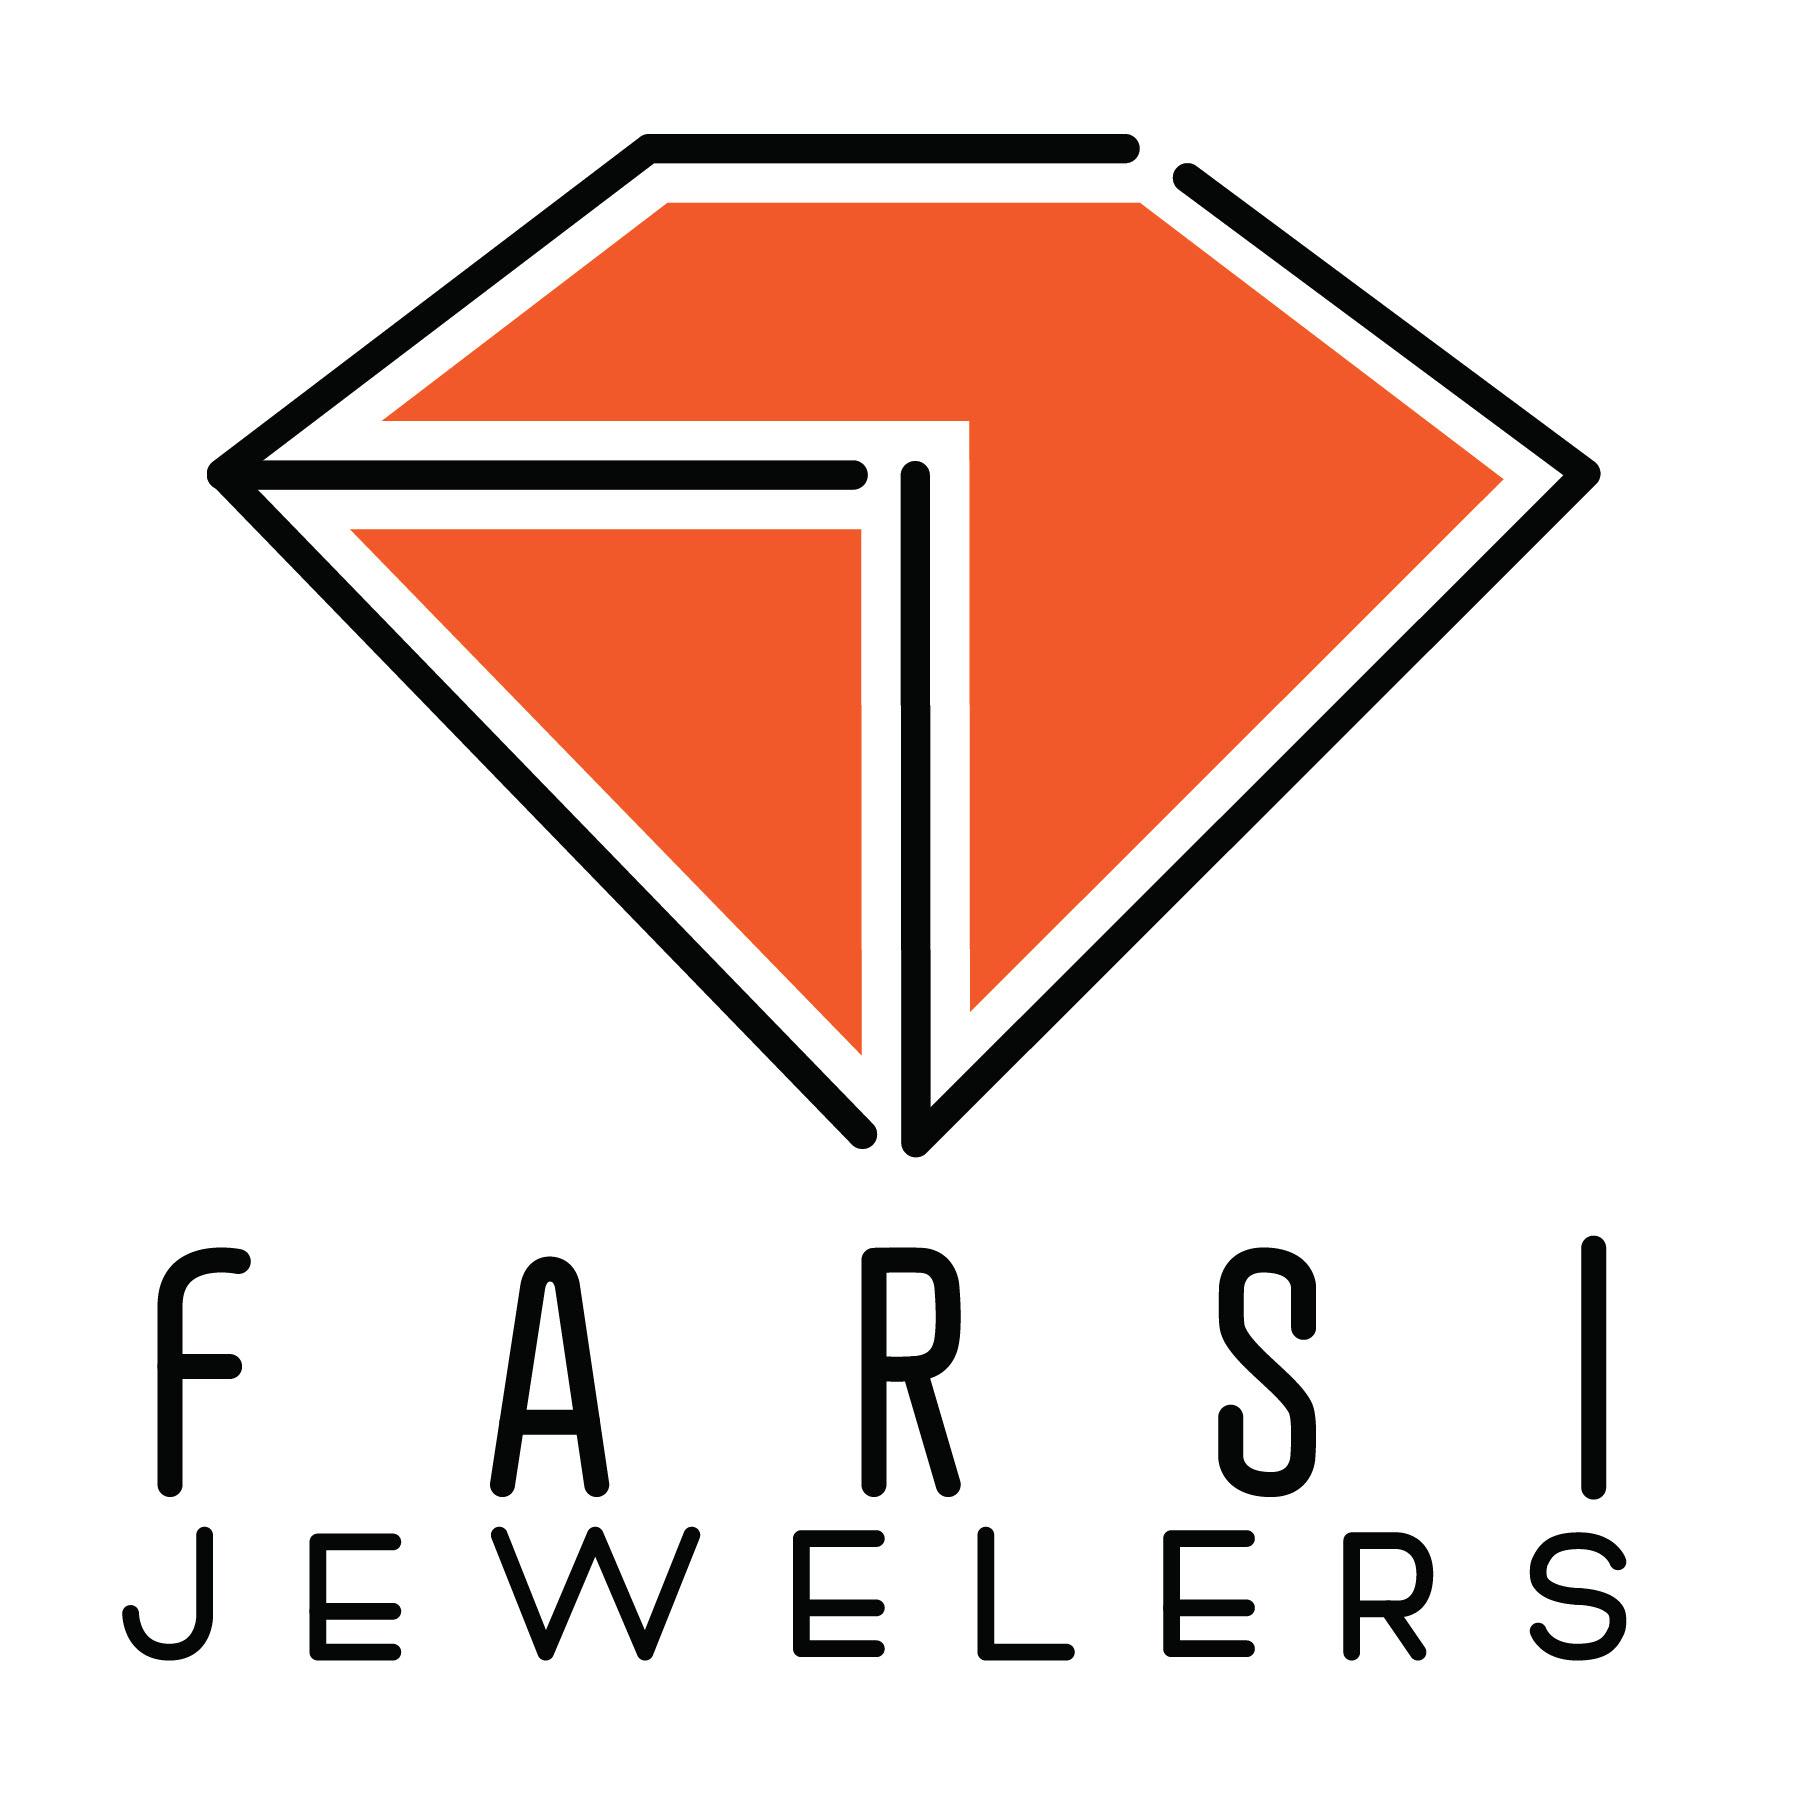 Farsi Jewelers